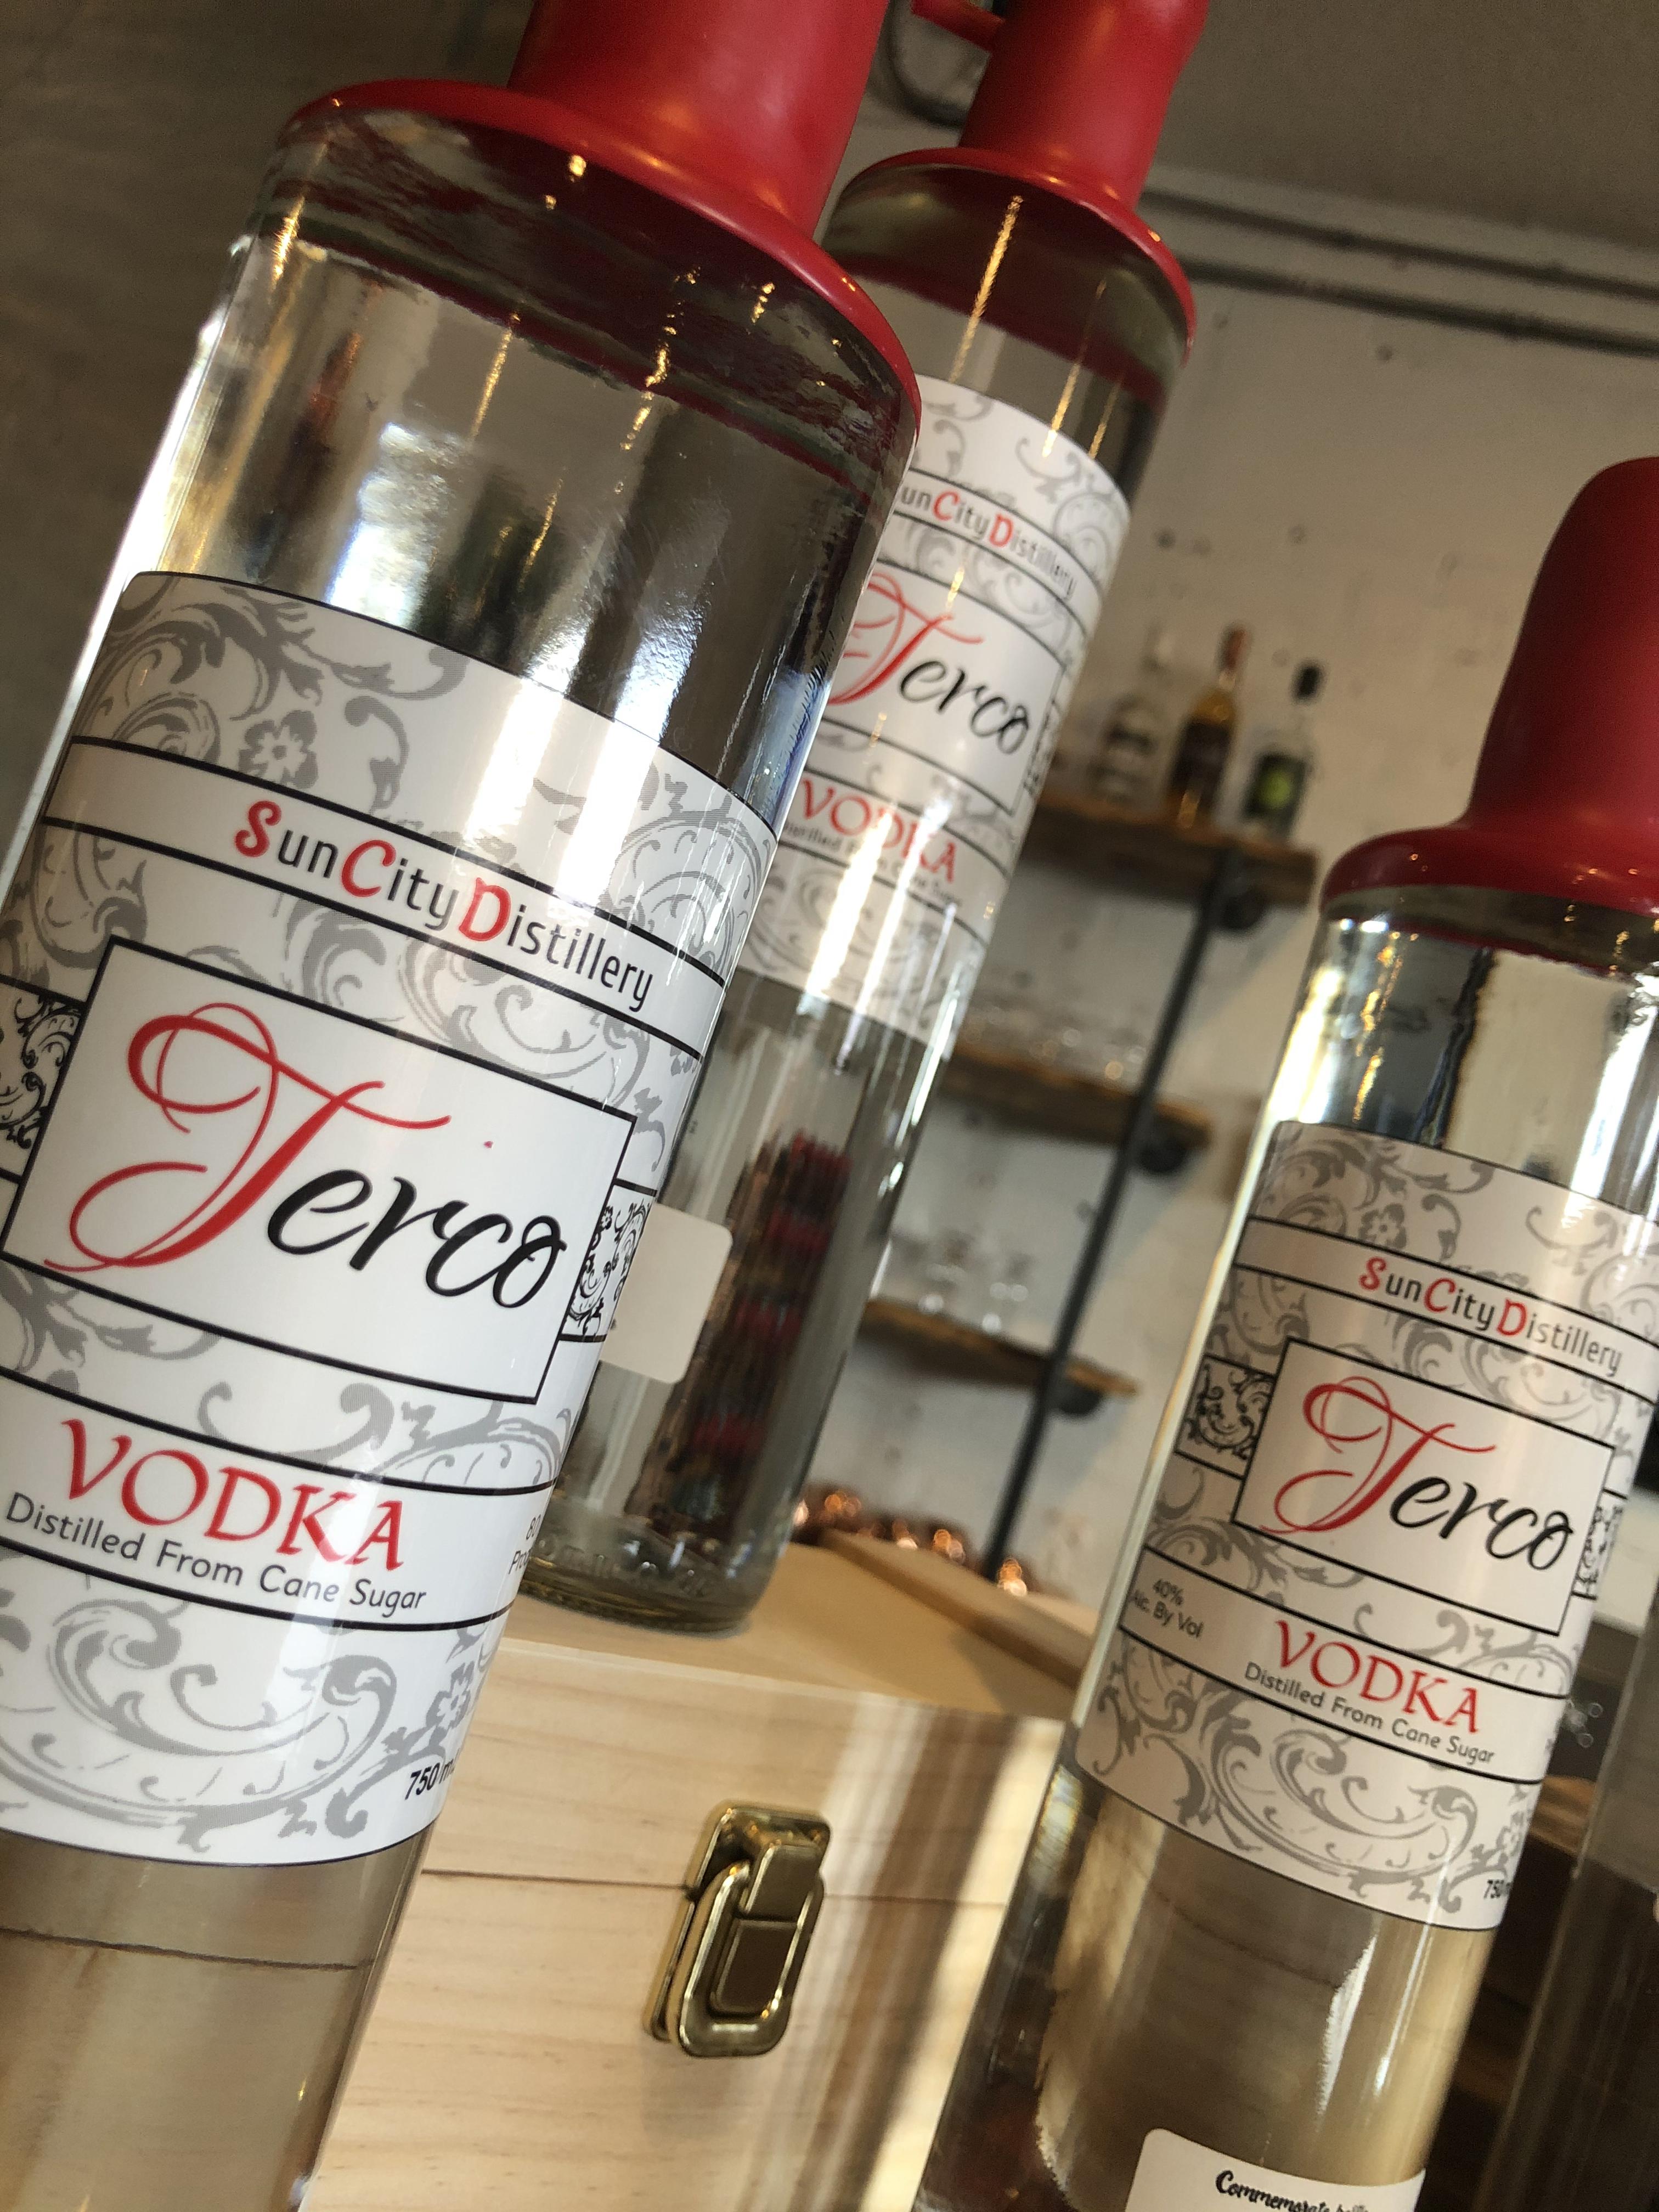 Terco Vodka